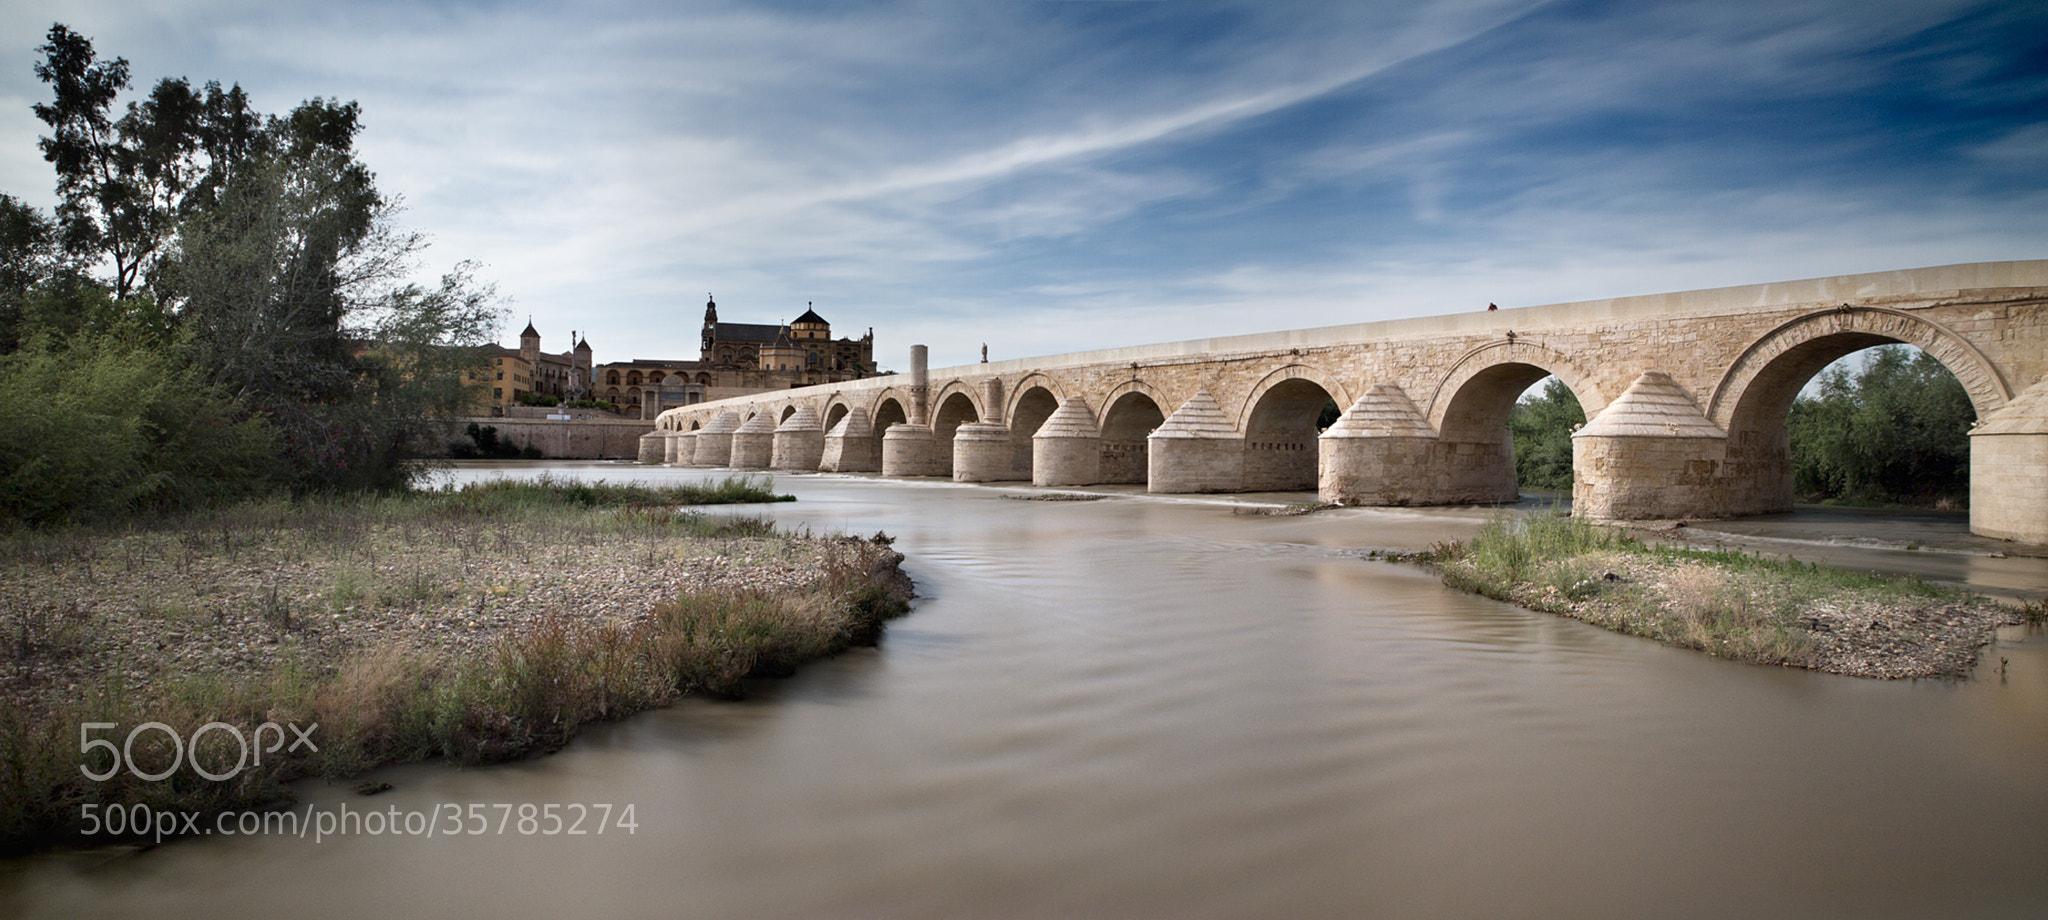 Photograph Roman Bridge by José Antonio Sánchez on 500px